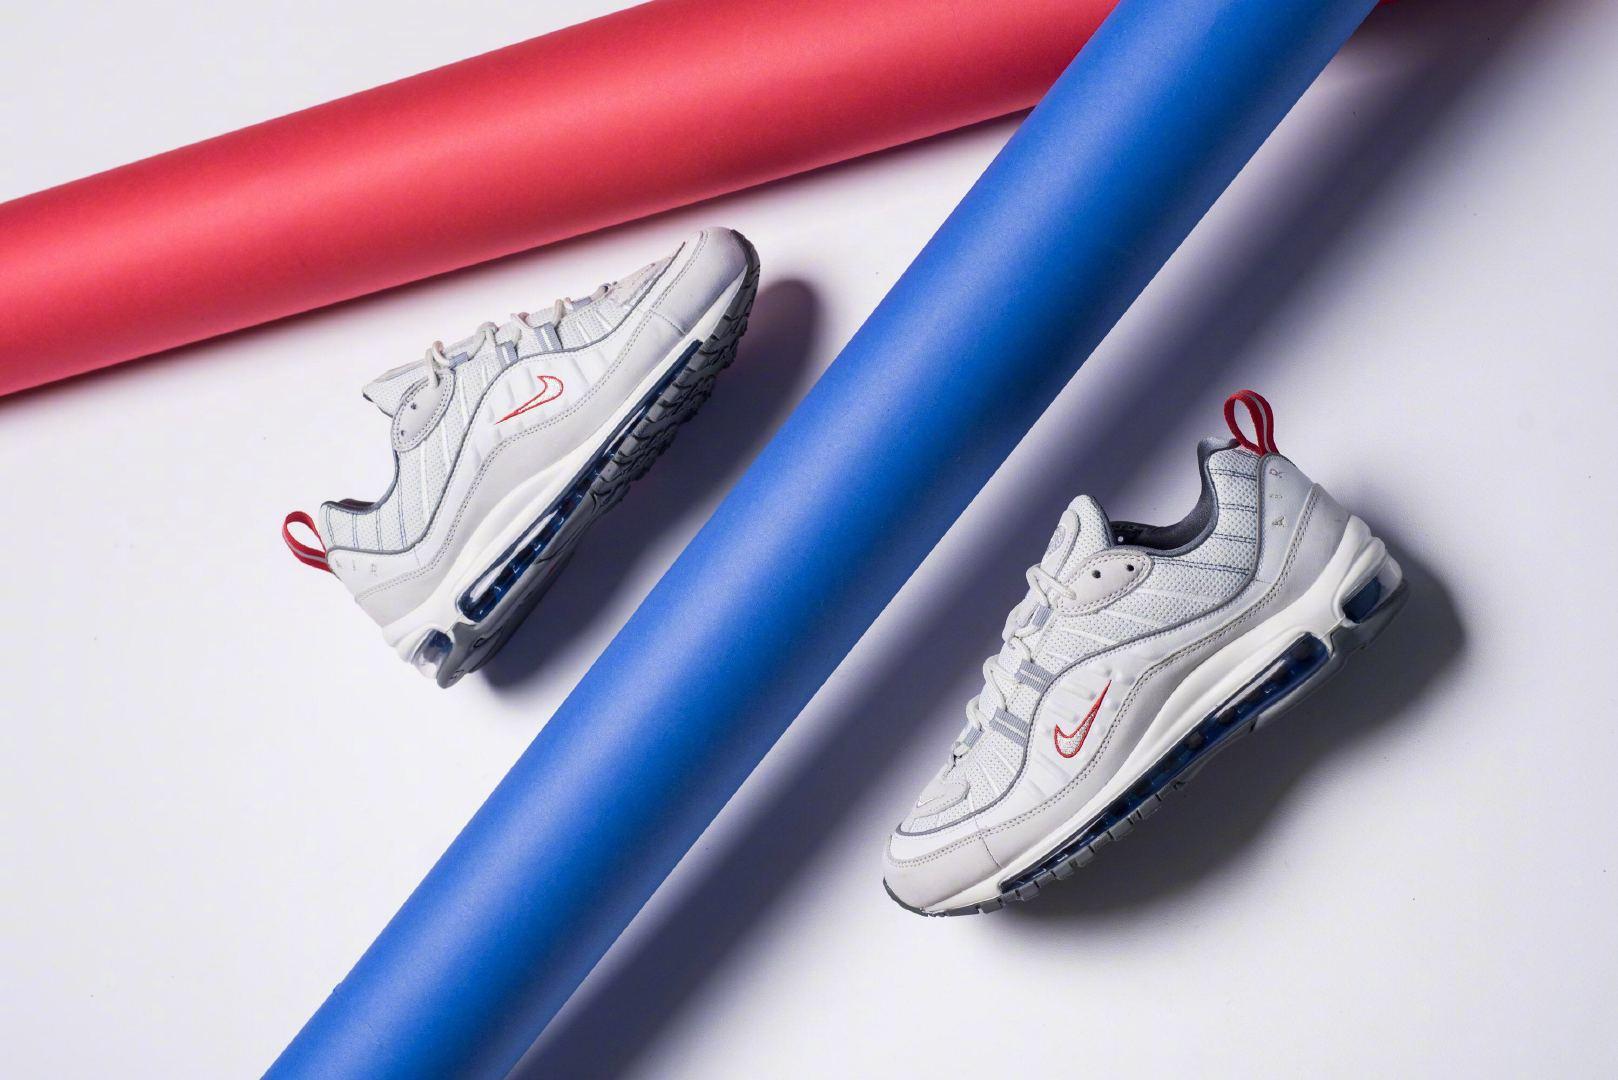 13b5f9a8883b Nike Air Max 98,奶奶的,蓝红也点缀的恰到好处!配色信息:Summit White Metallic Silver北美发售价格: 170.00货号:CD1538-100images  via Sneaker Politics